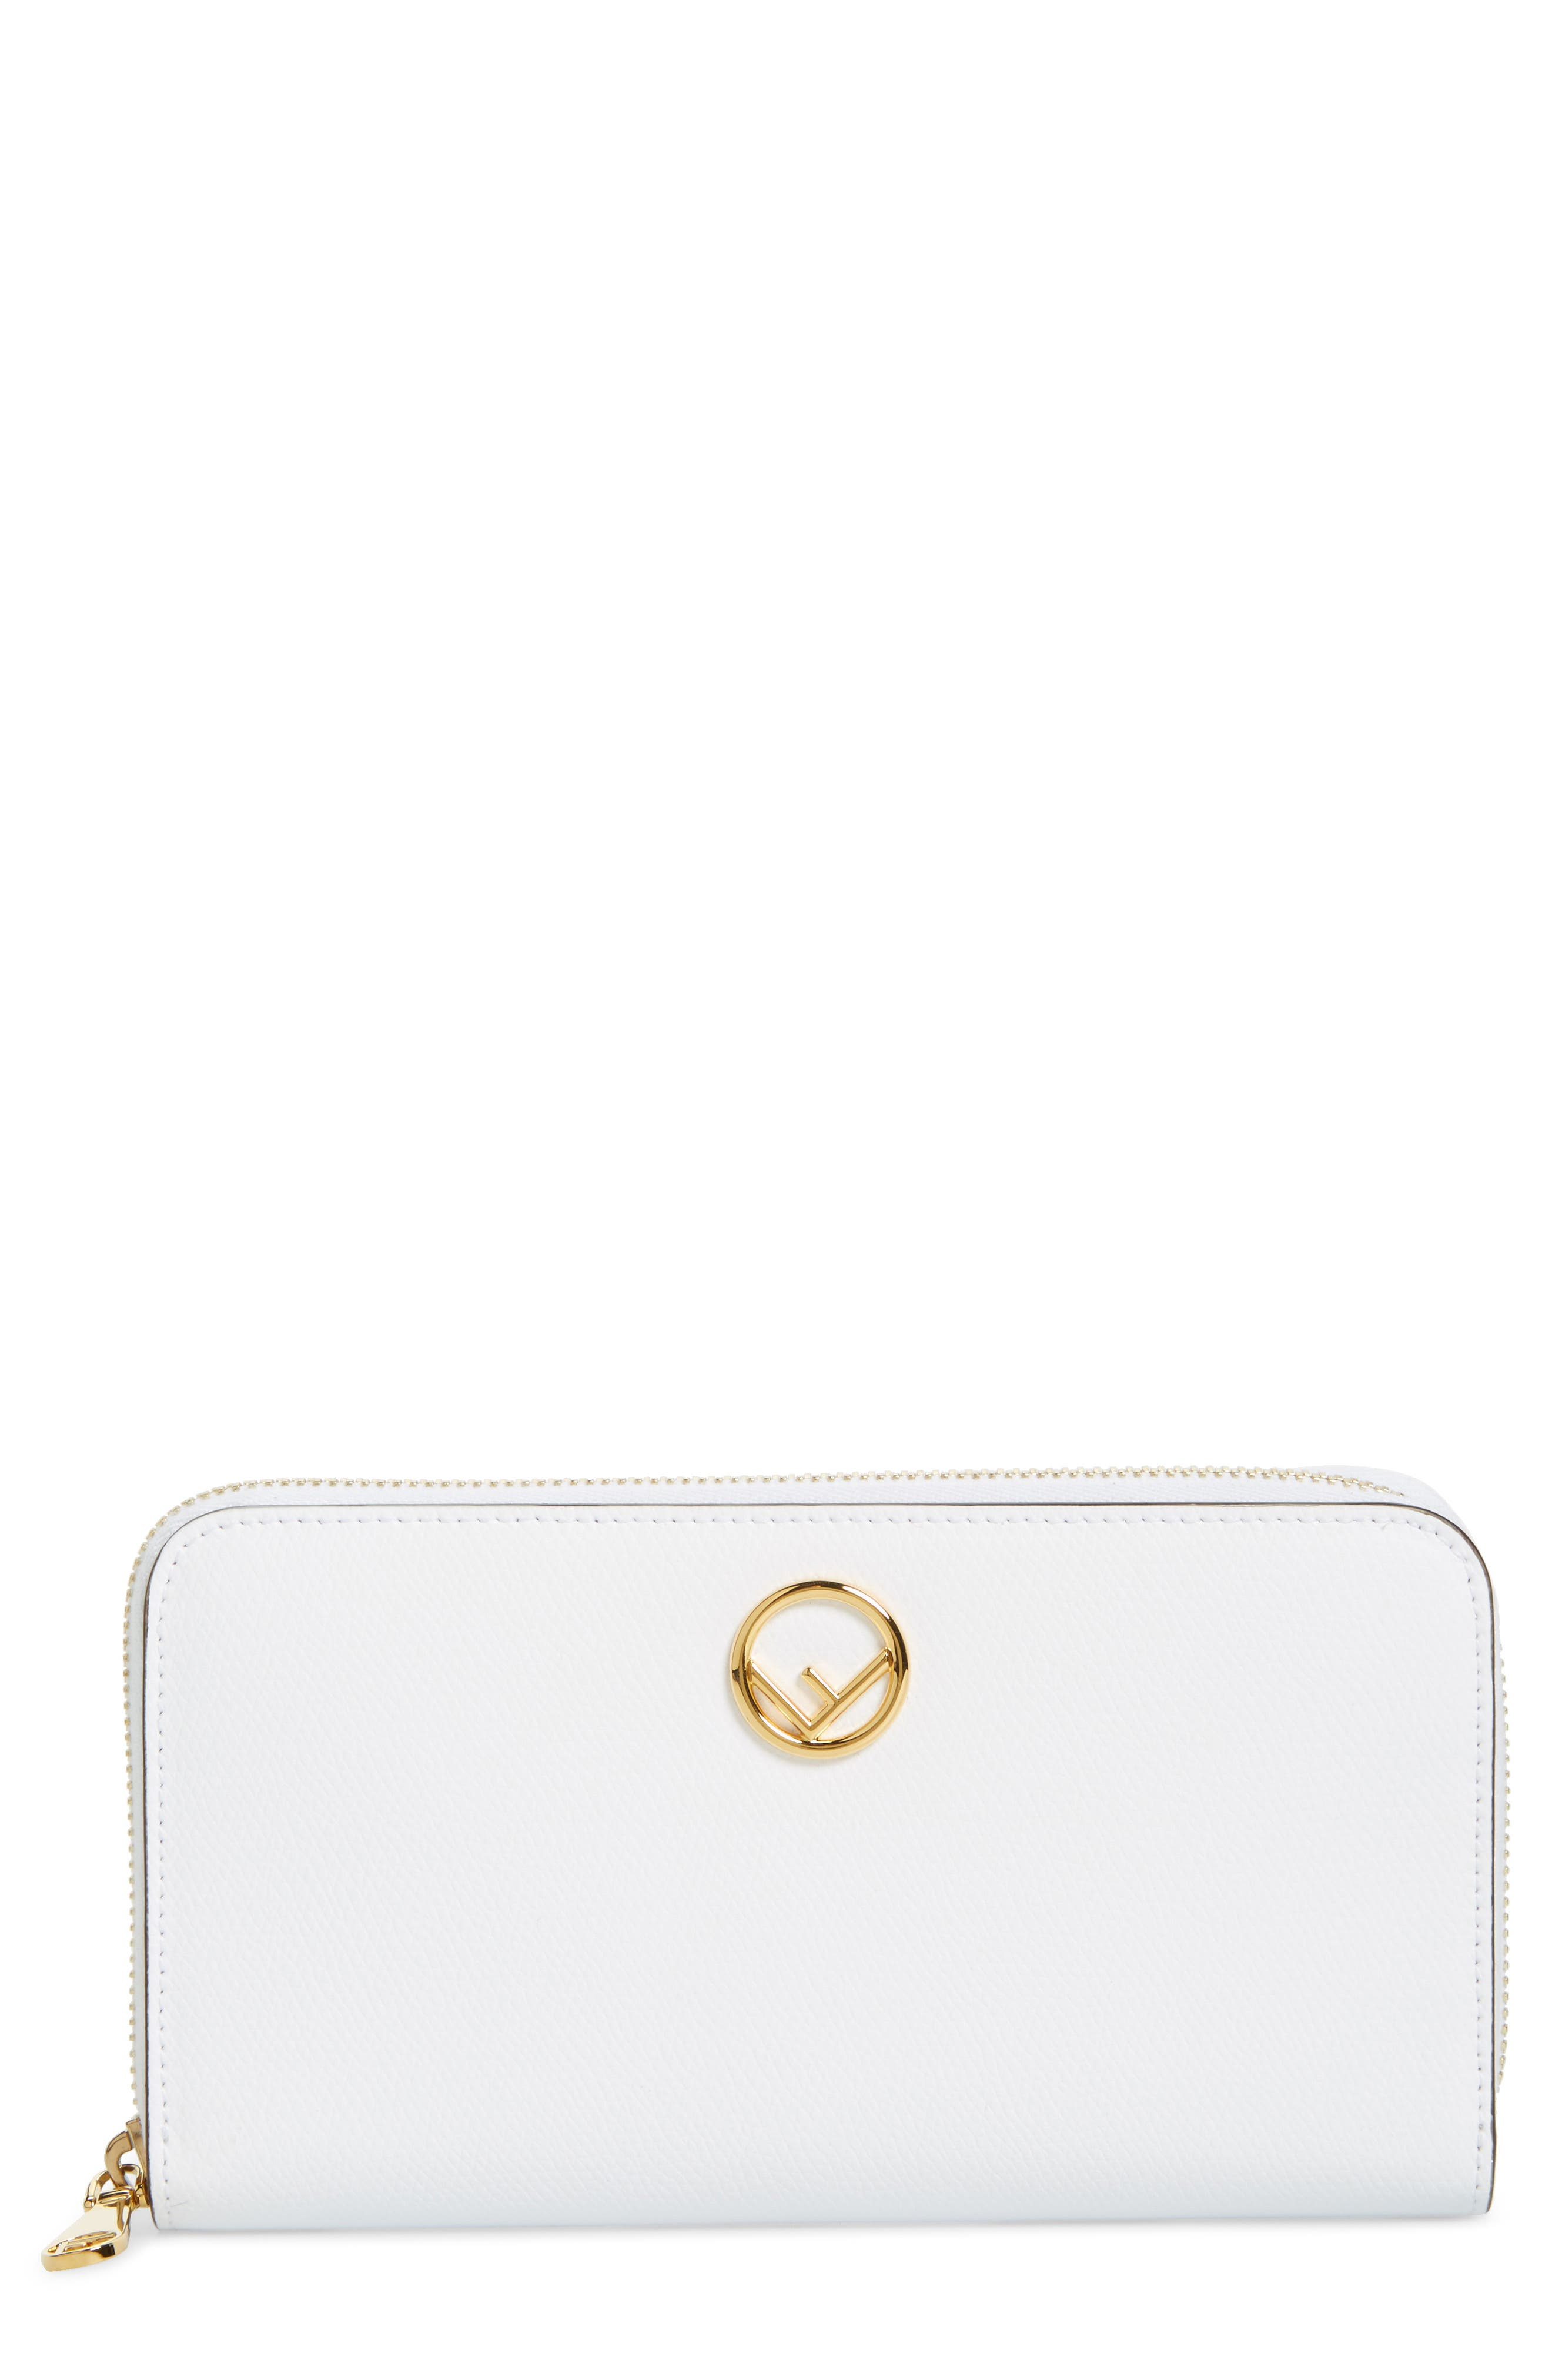 Fendi Logo Zip Around Leather Wallet